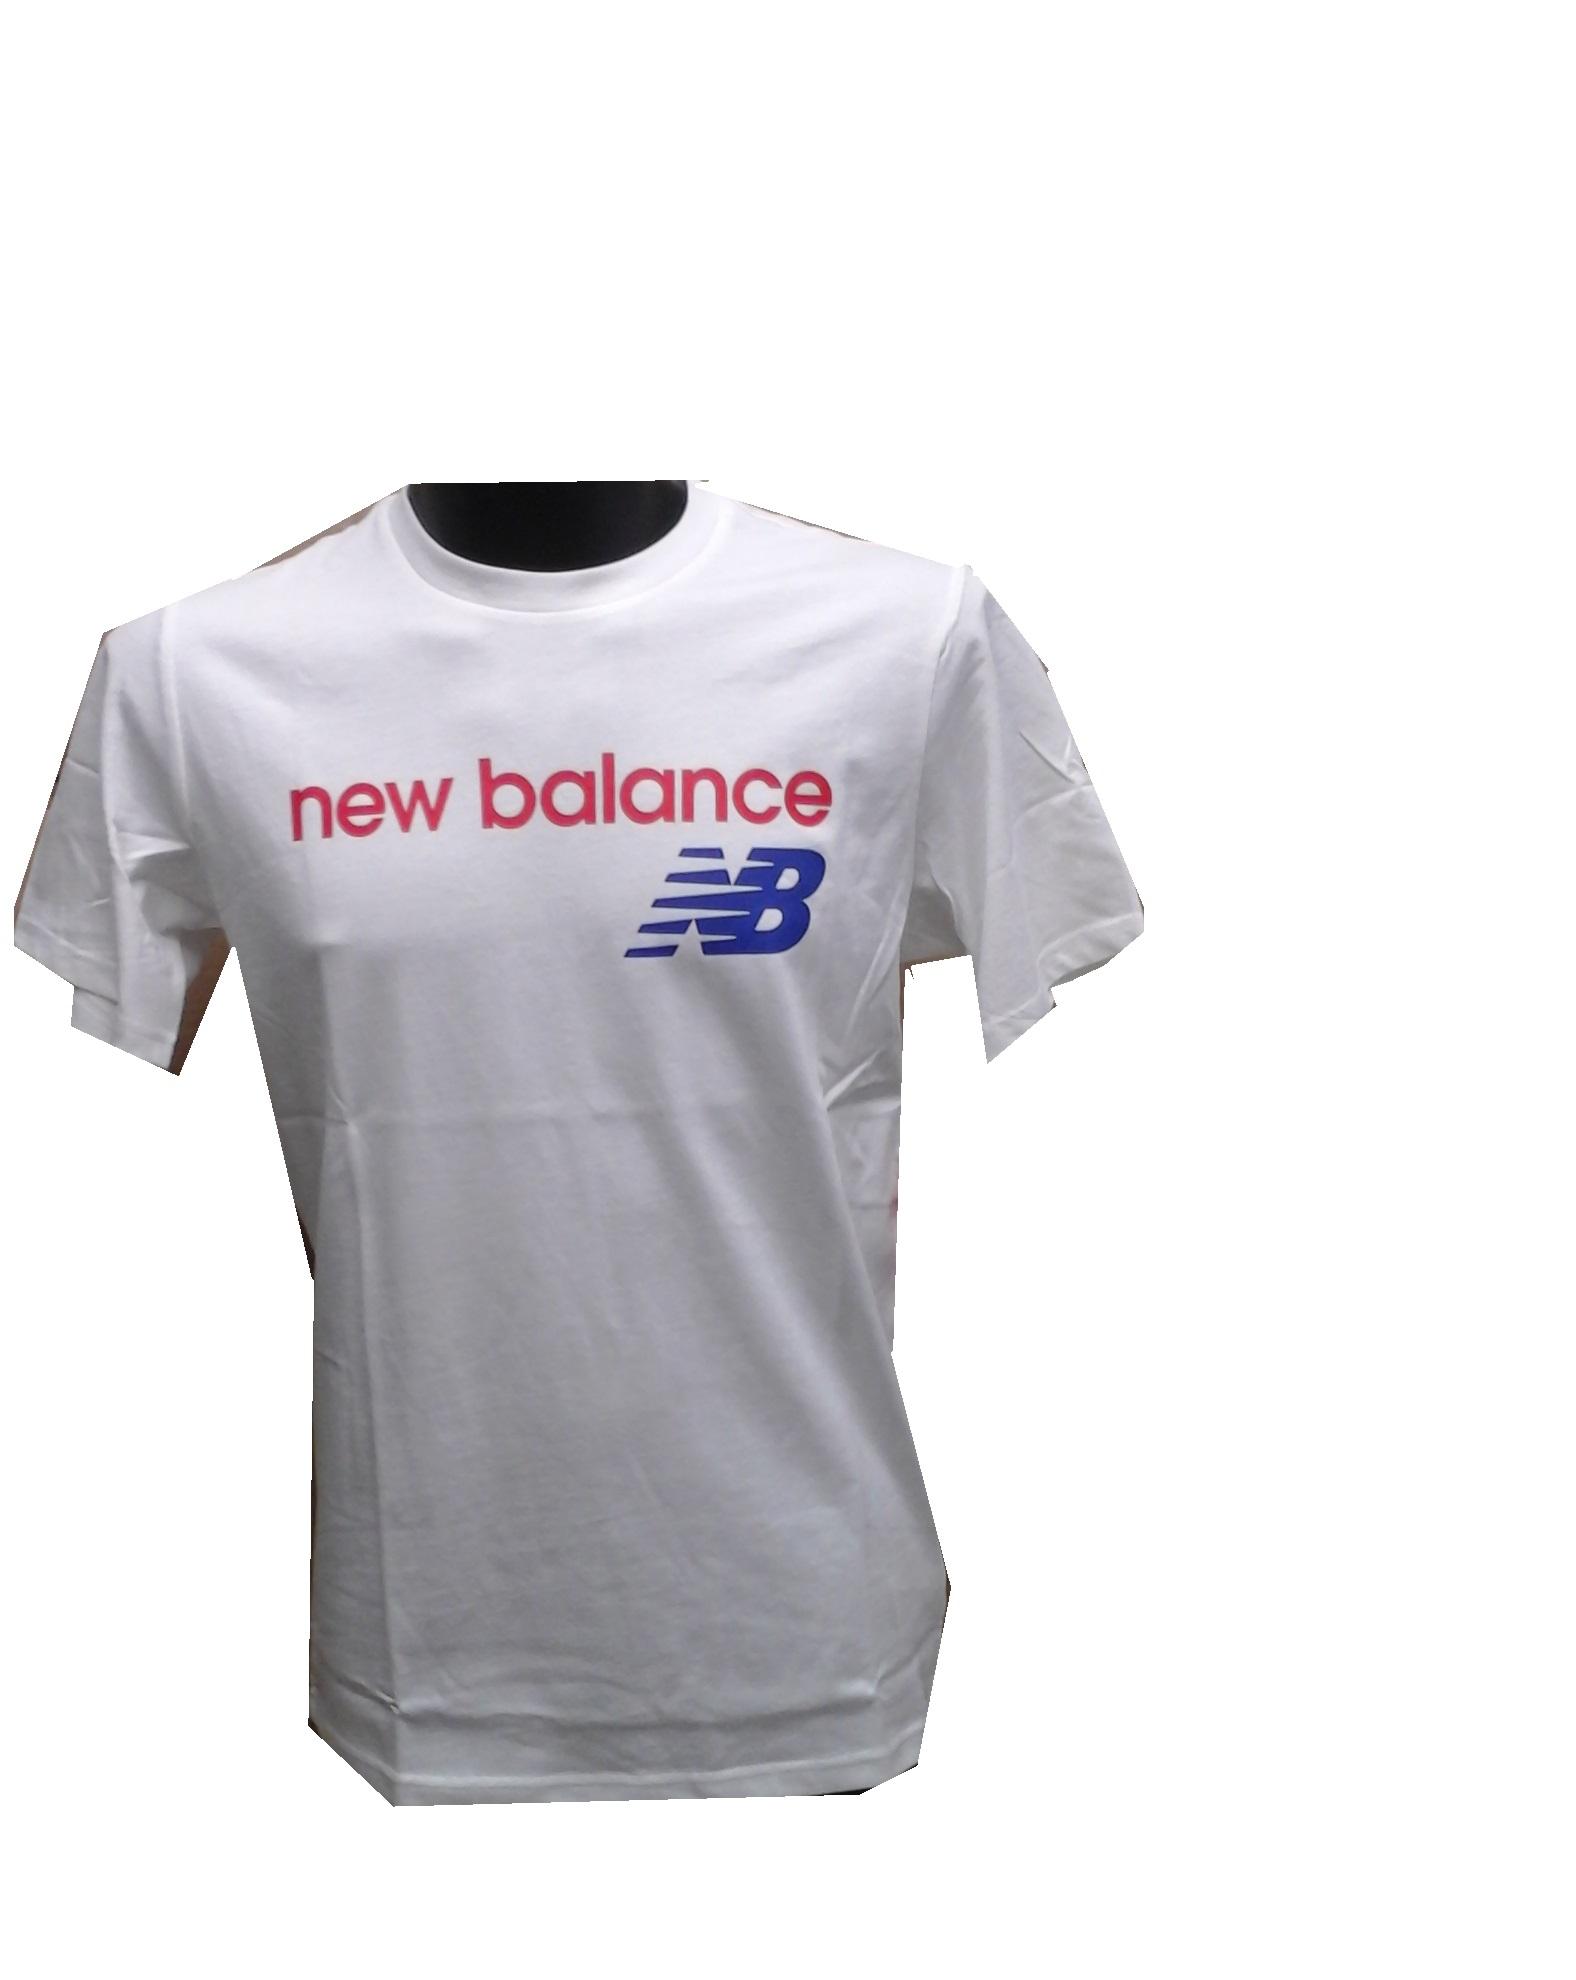 tee shirt loisir nb athletic bleu blanc rouge new balance sportpro natation. Black Bedroom Furniture Sets. Home Design Ideas